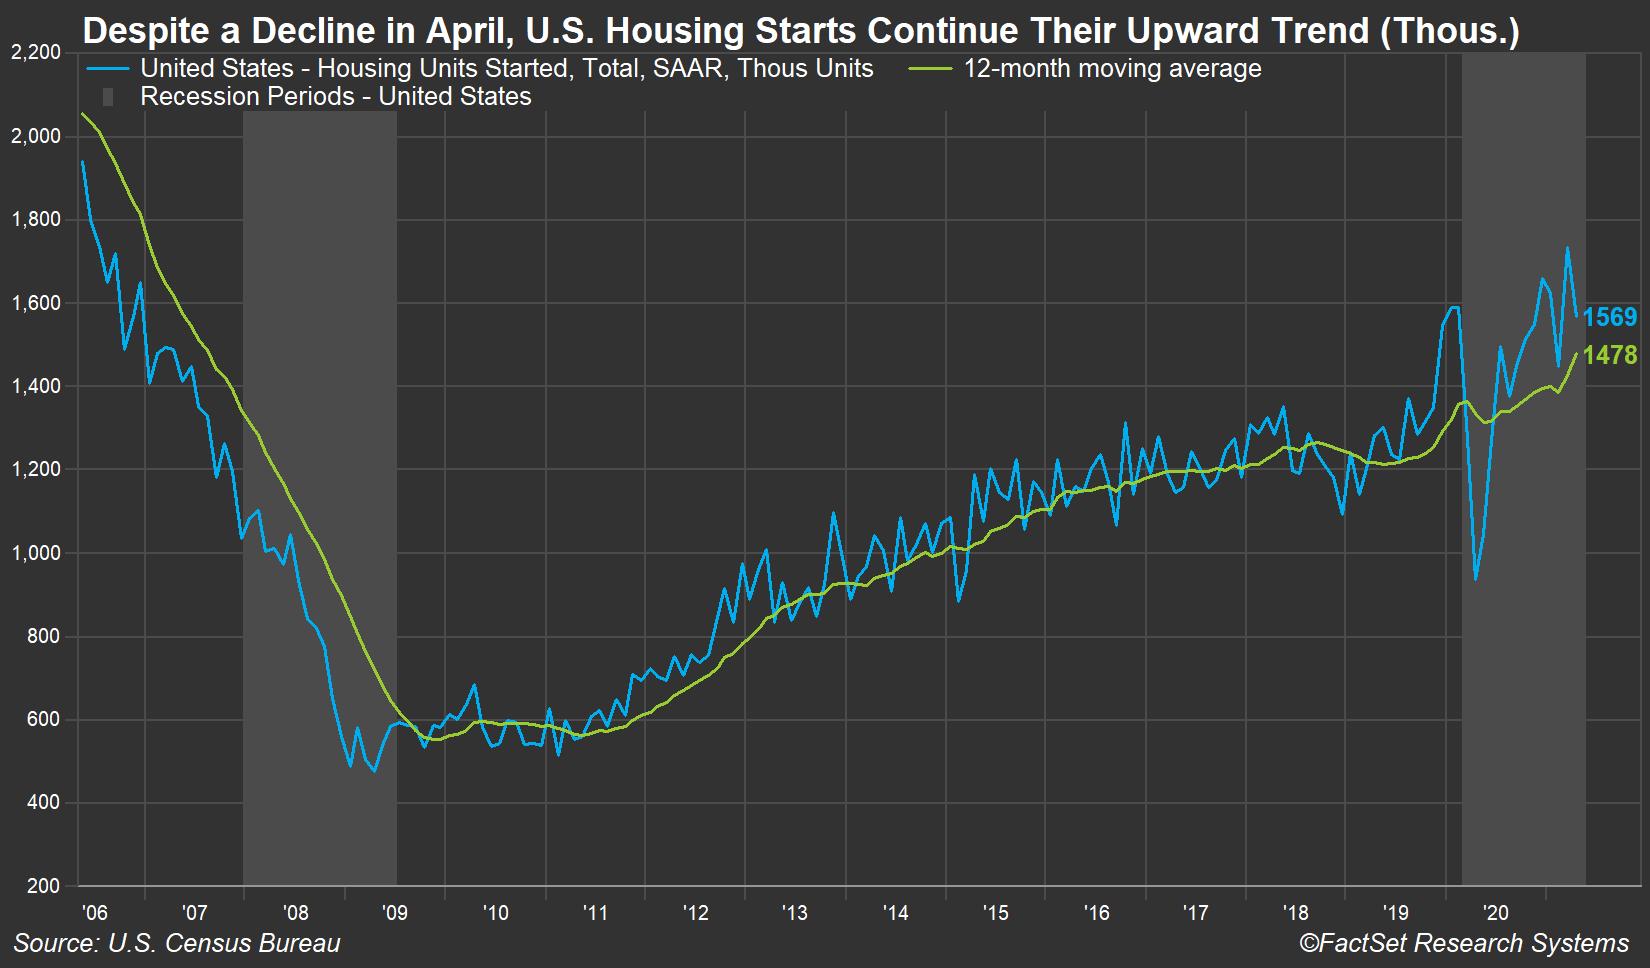 US Housing Starts